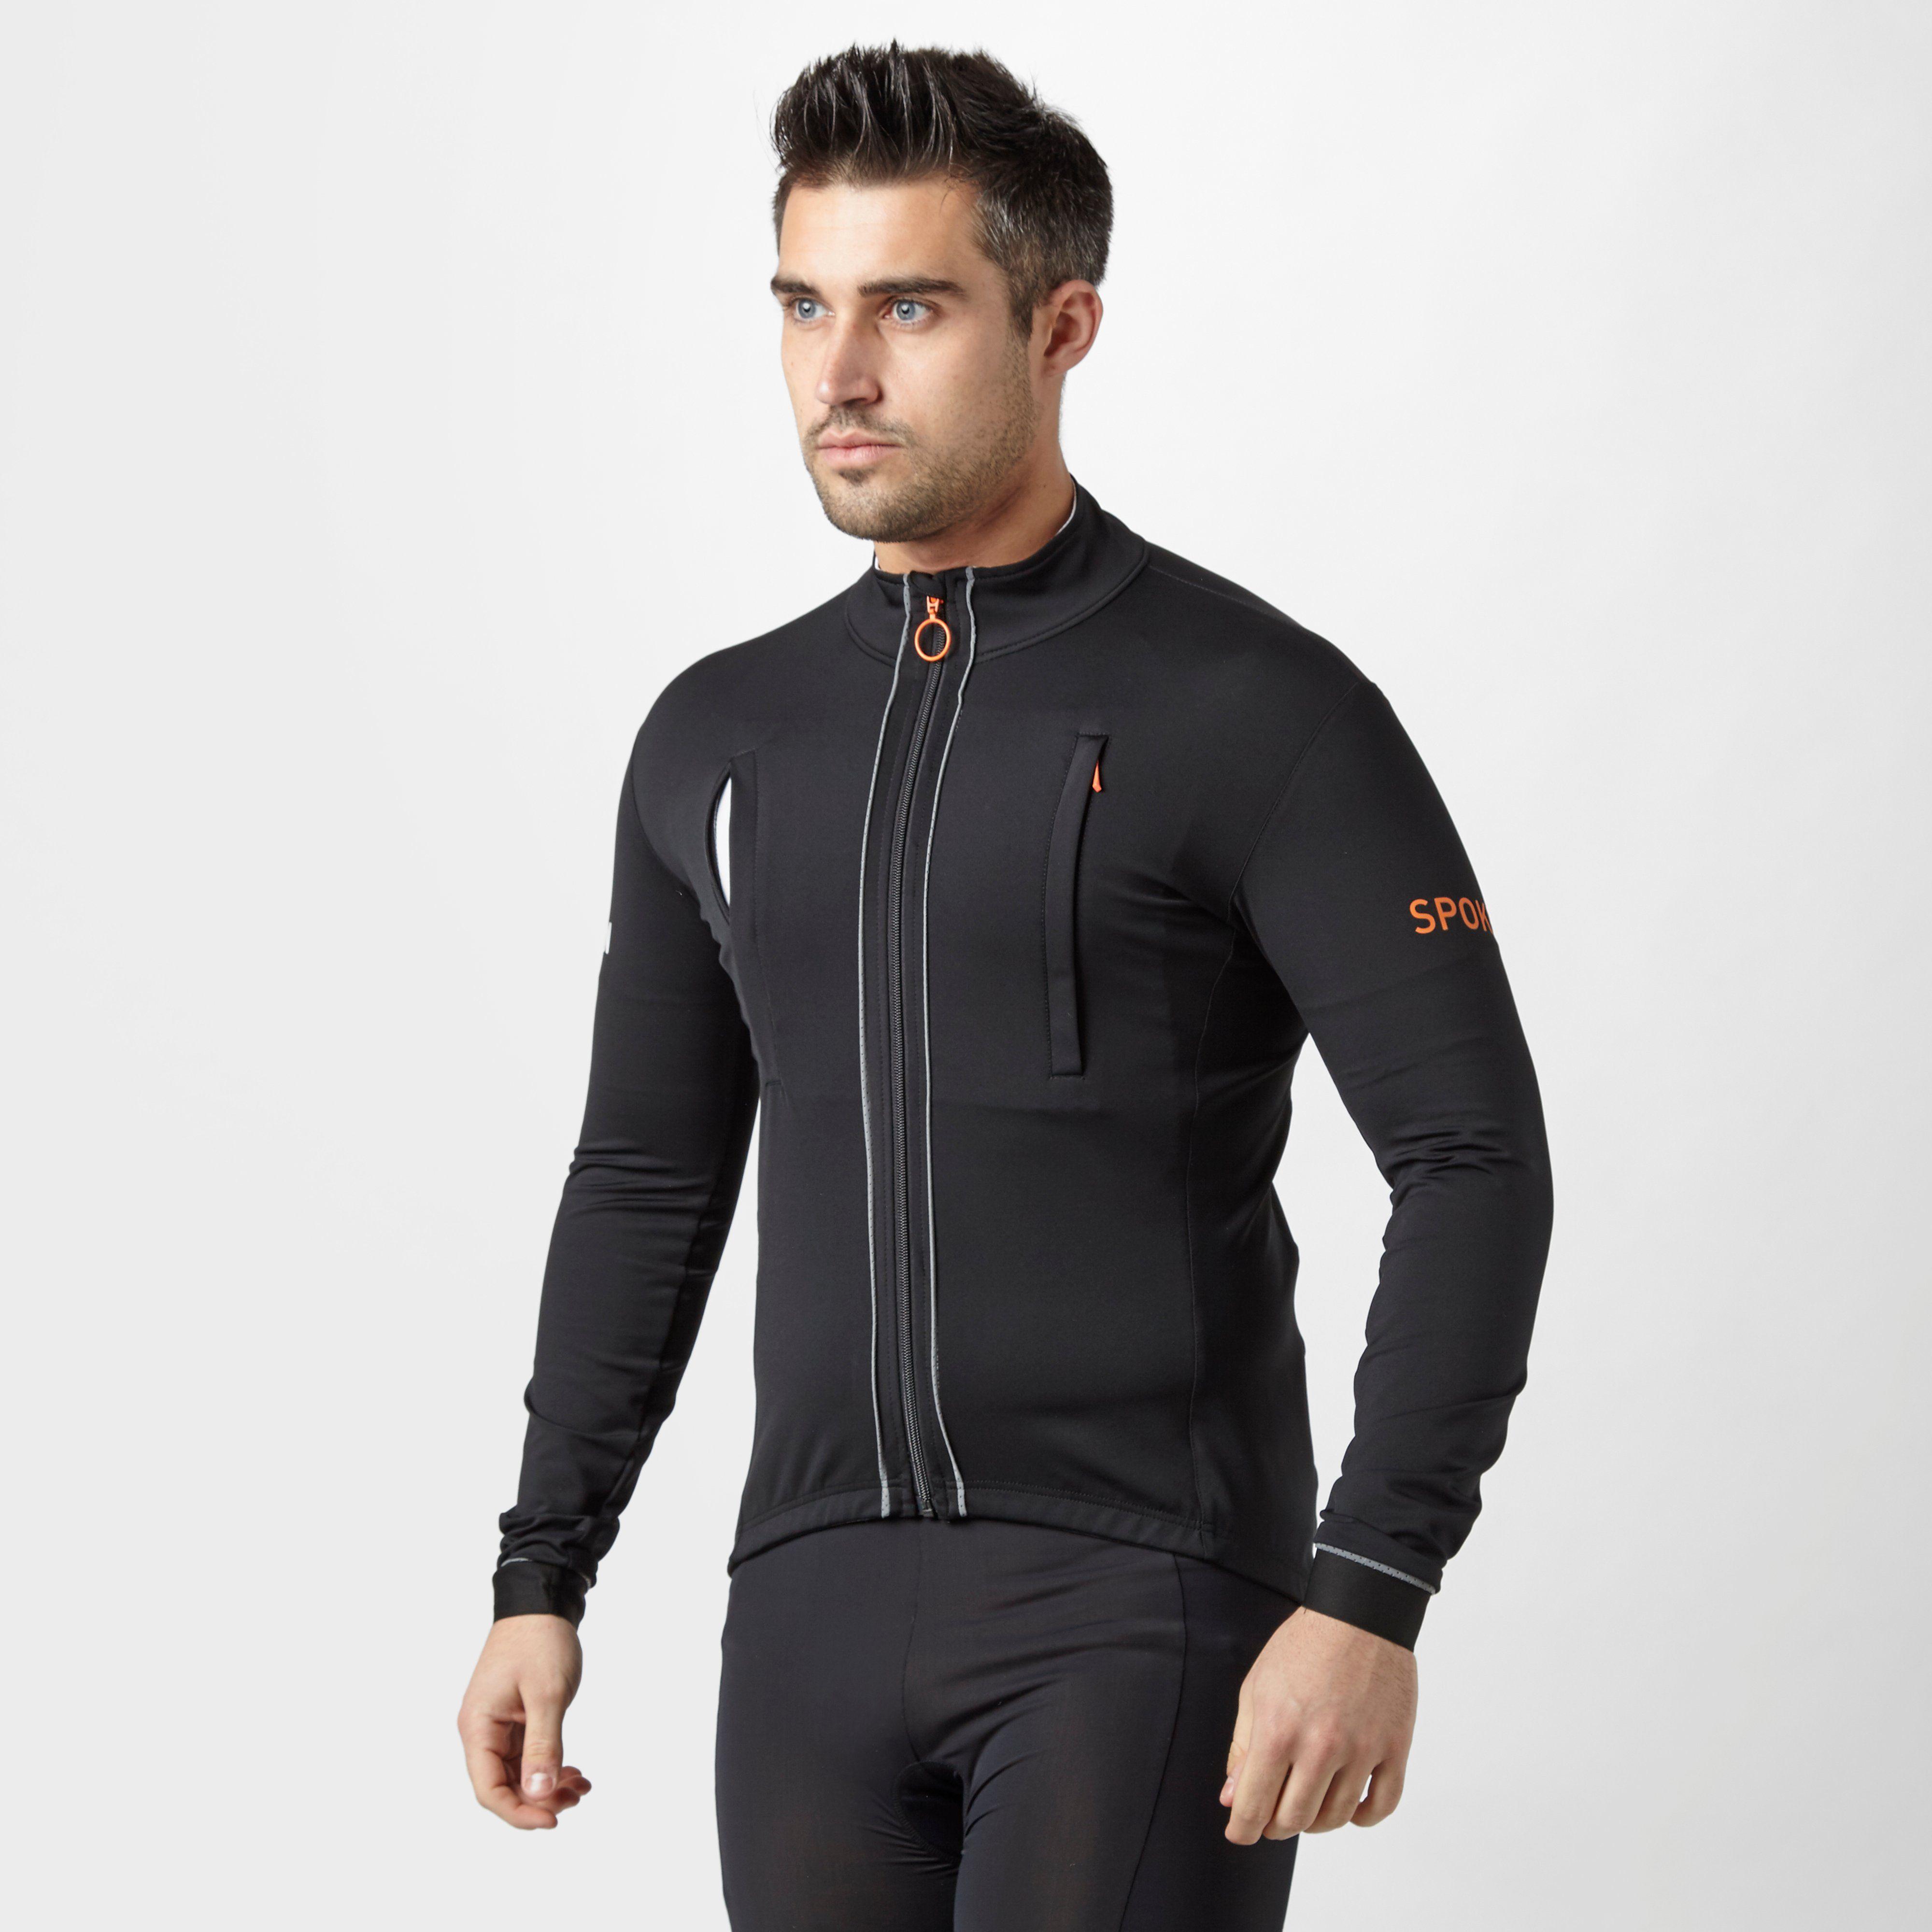 SPOKESMAN Men's Ghost Cycling Jacket